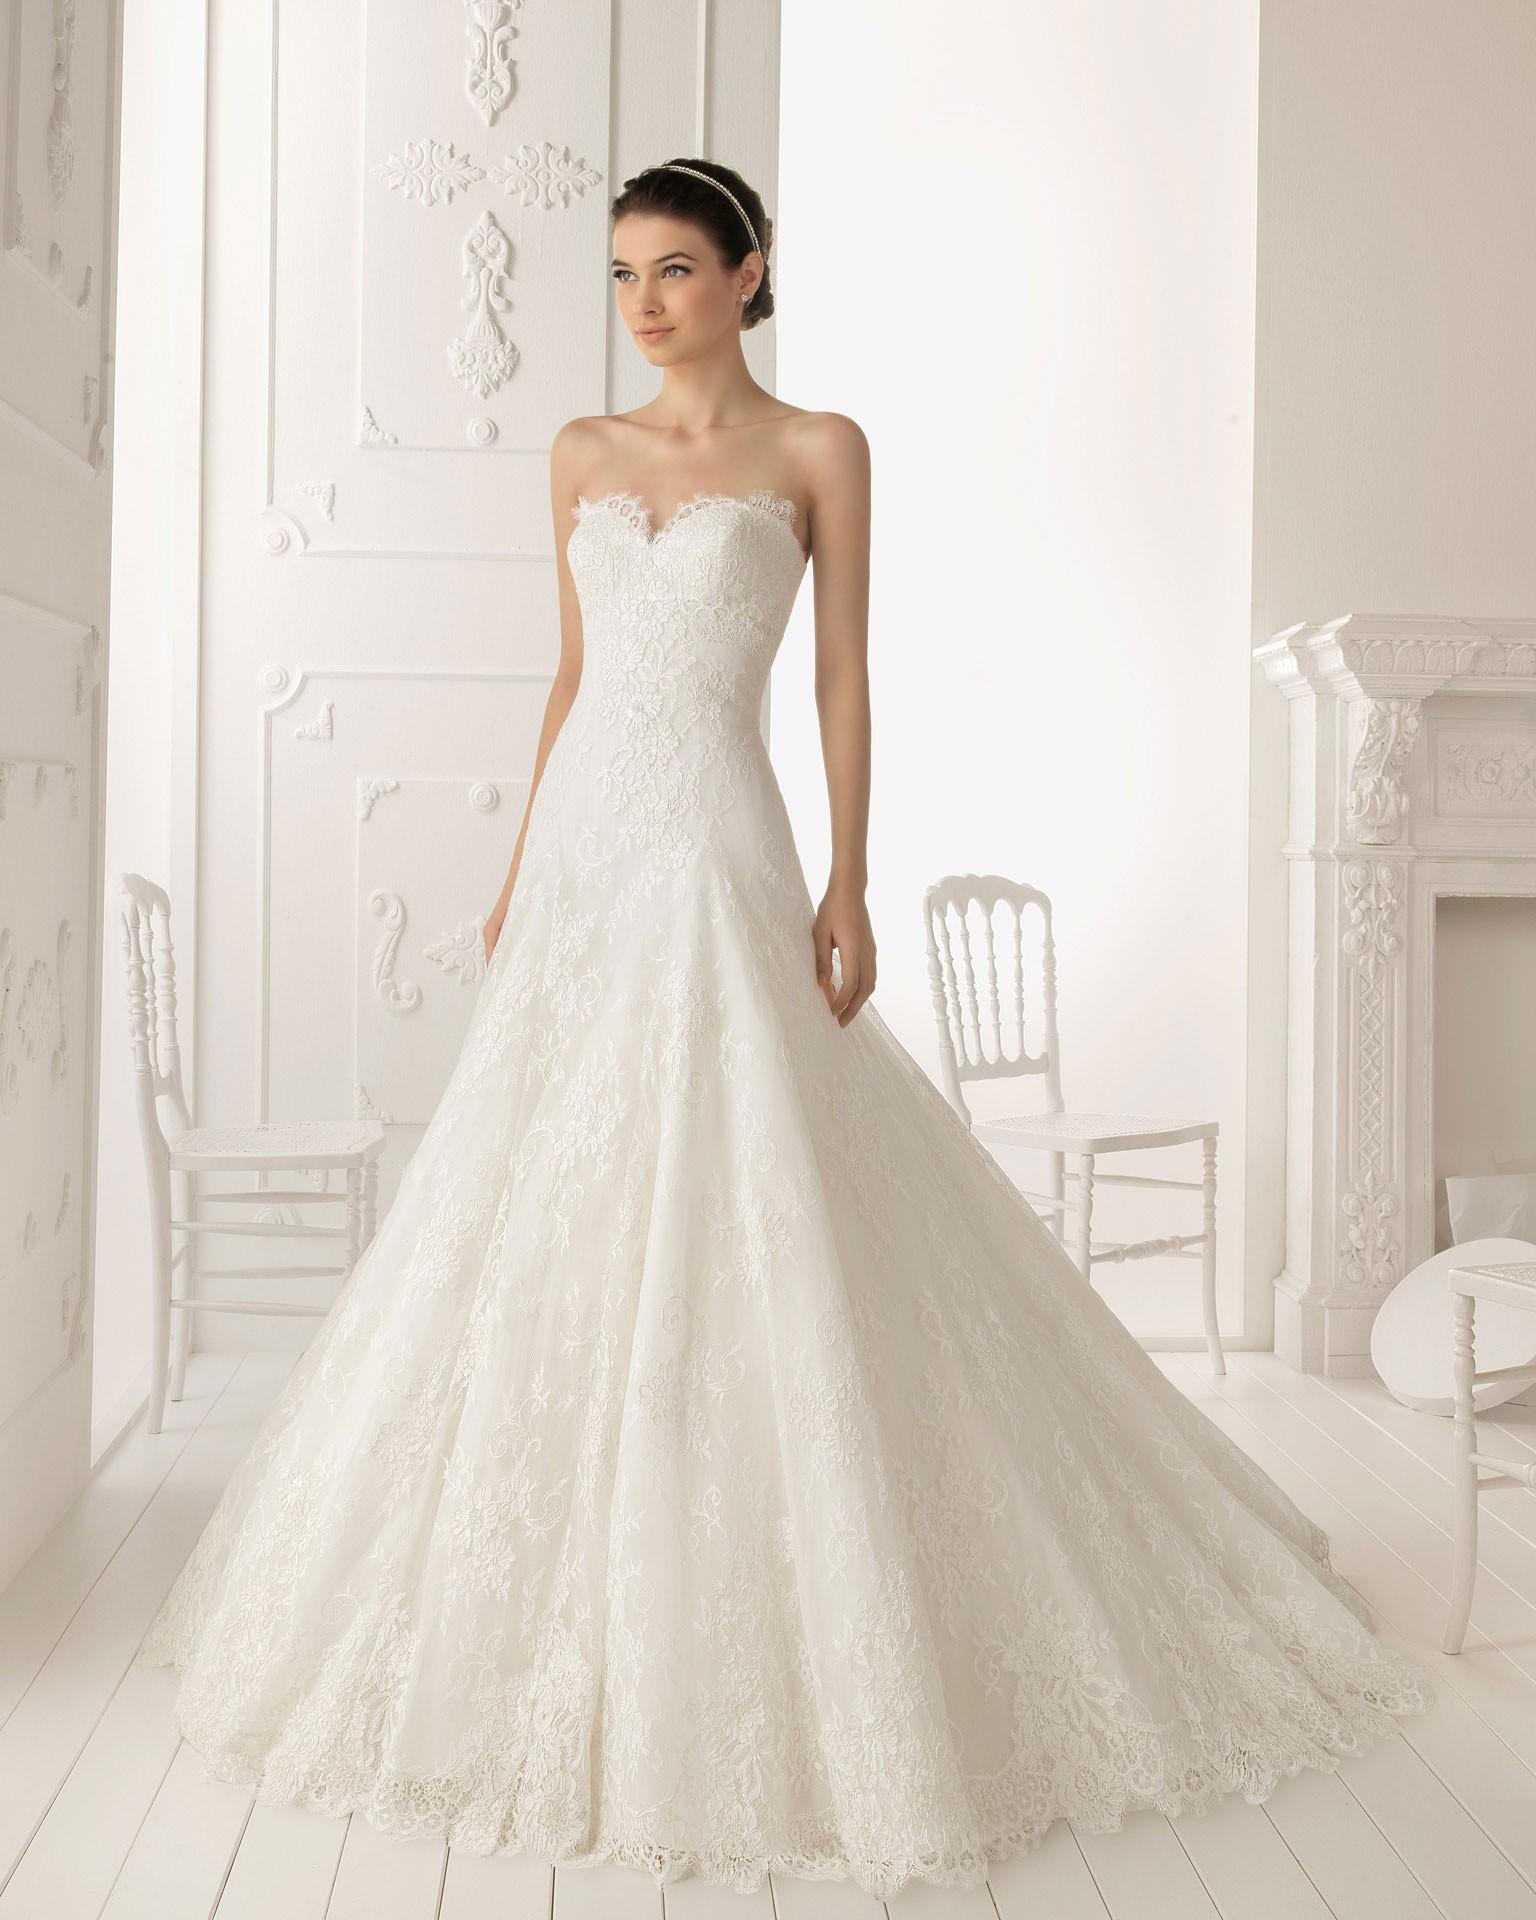 Wedding Attire: Drop Waist Wedding Dress